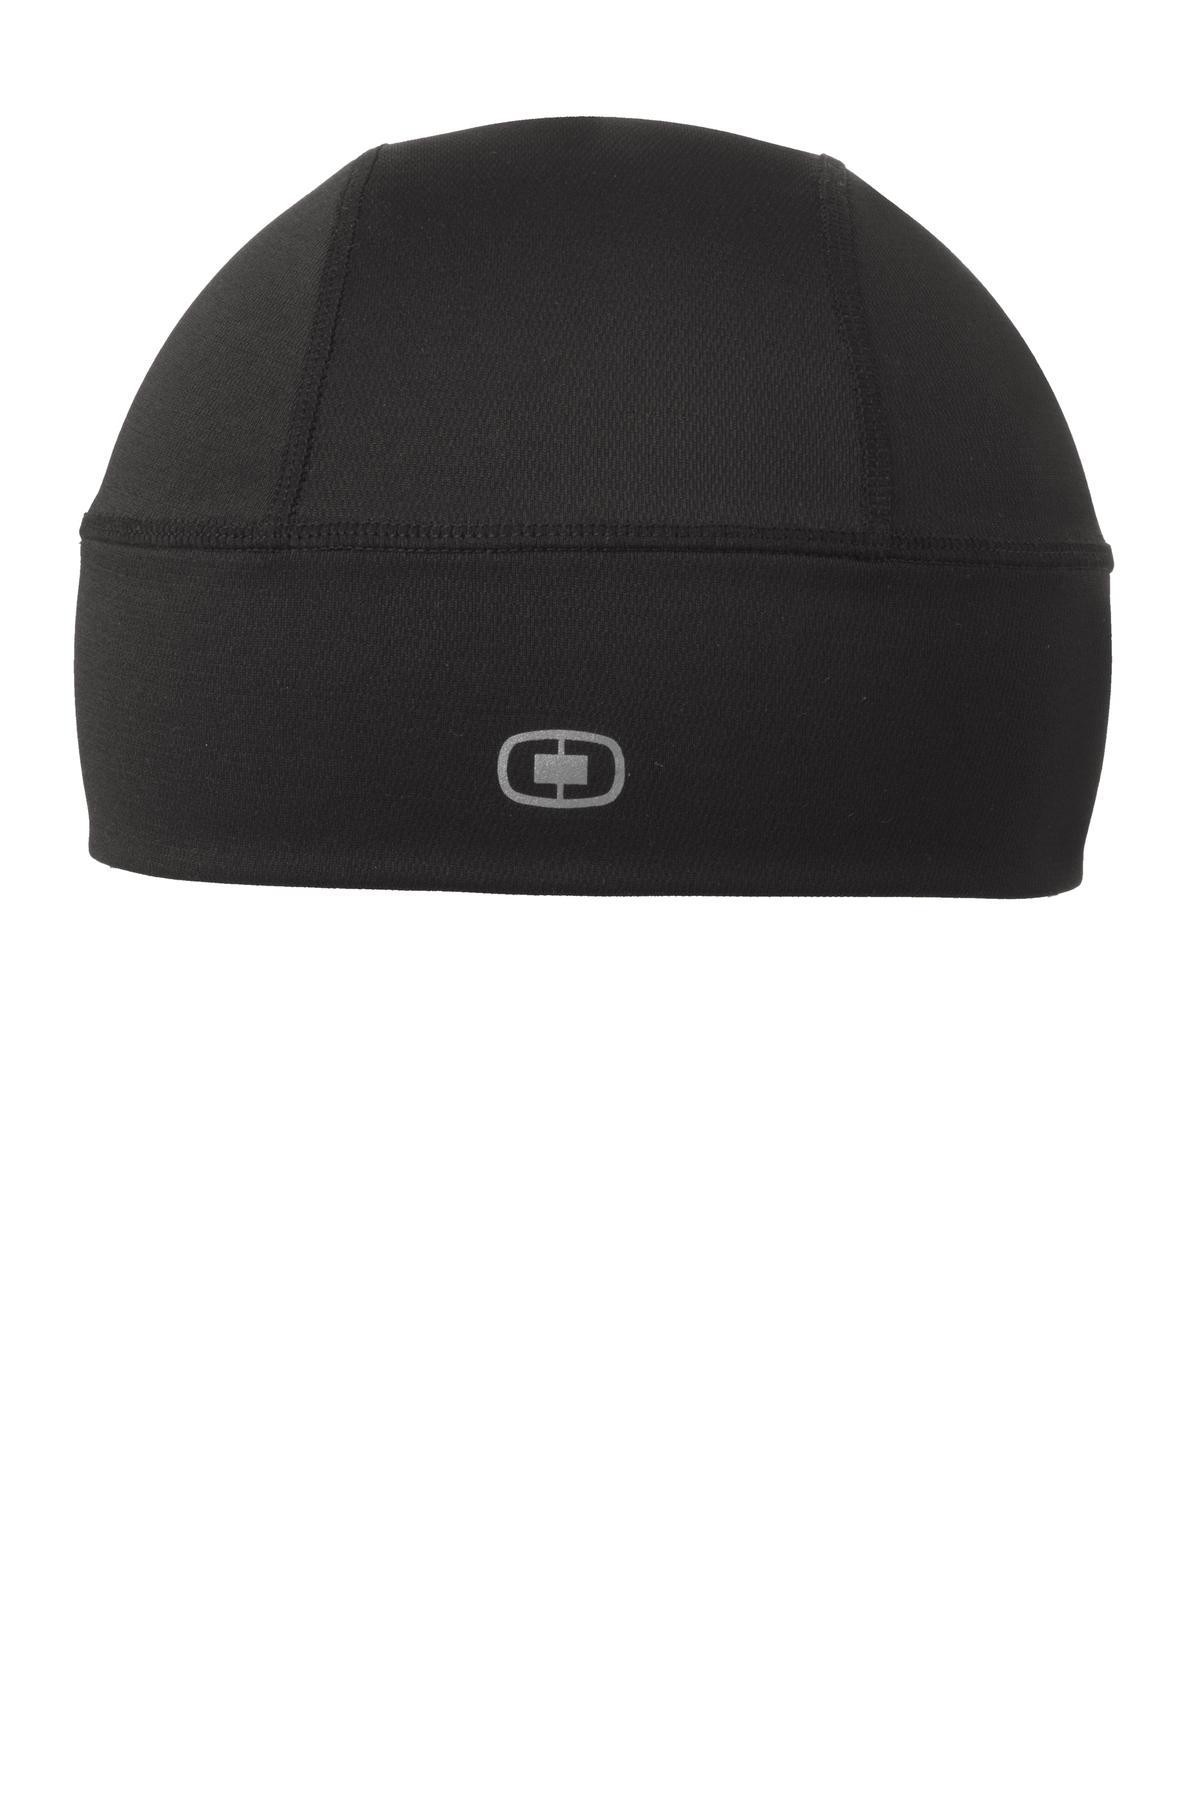 f2b5810e47f OGIO® OE652 - ENDURANCE Fulcrum Beanie - Headwear